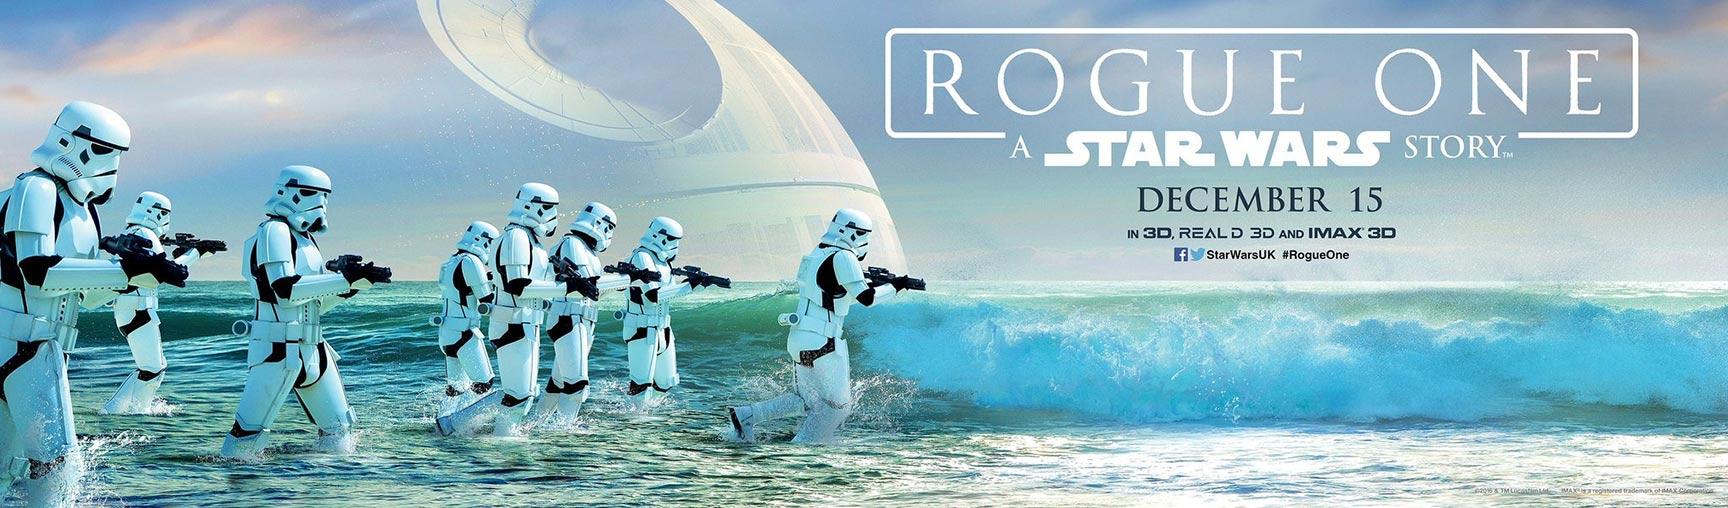 CRÍTICAS DE CINE . Star-wars-rogue-one-poster-14